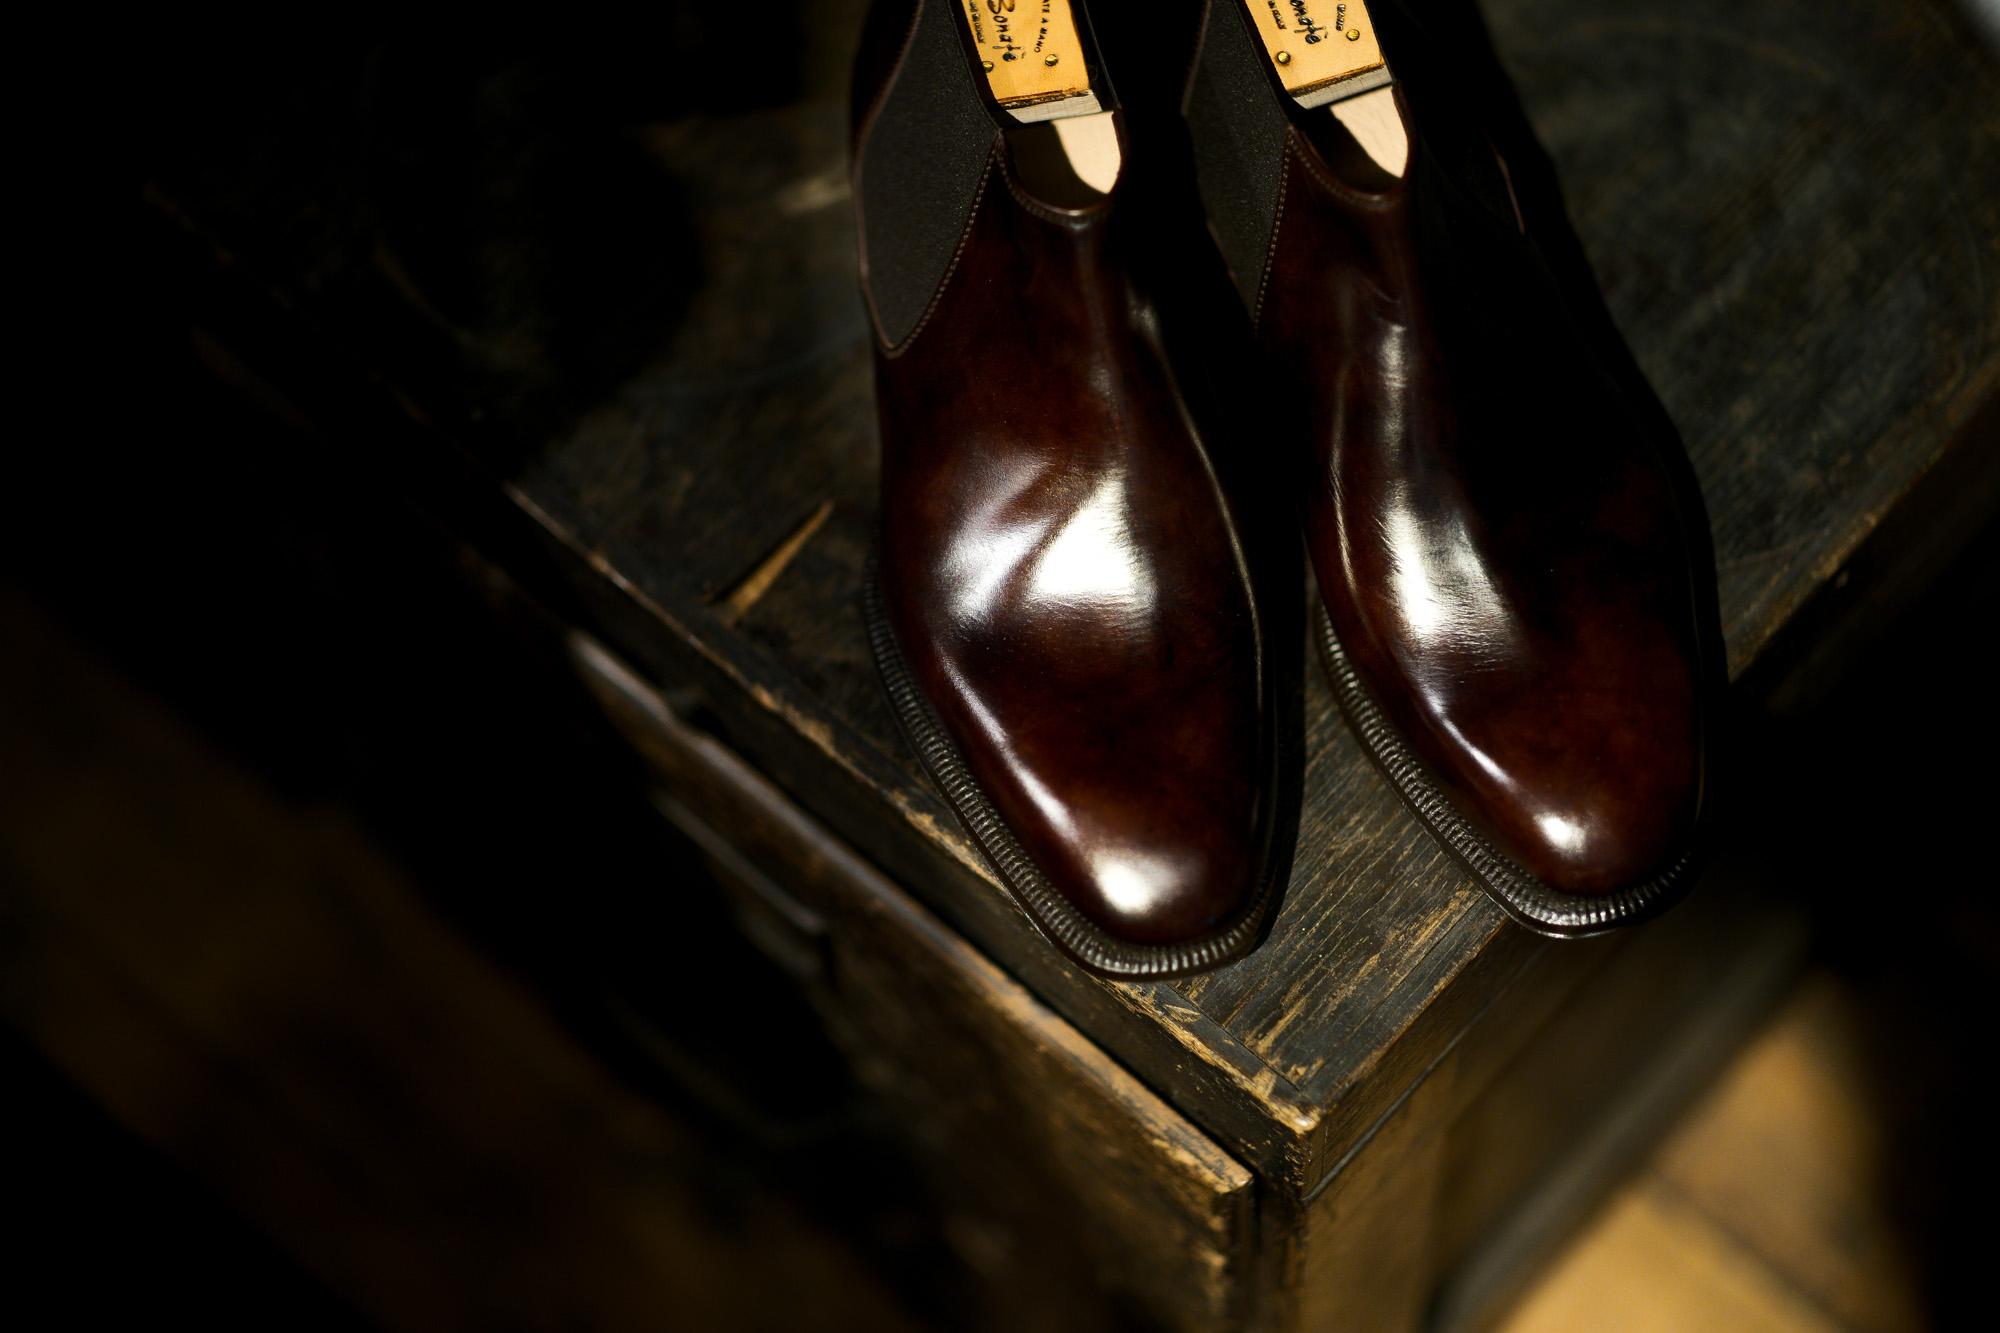 ENZO BONAFE (エンツォボナフェ) CARY GRANT III(ゲーリーグラント3) MUSEUM CALF(ミュージアムカーフ) Side gore Boots サイドゴアブーツ DARK BROWN(ダークブラウン) made in italy (イタリア製) 2021 愛知 名古屋 Alto e Diritto altoediritto アルトエデリット